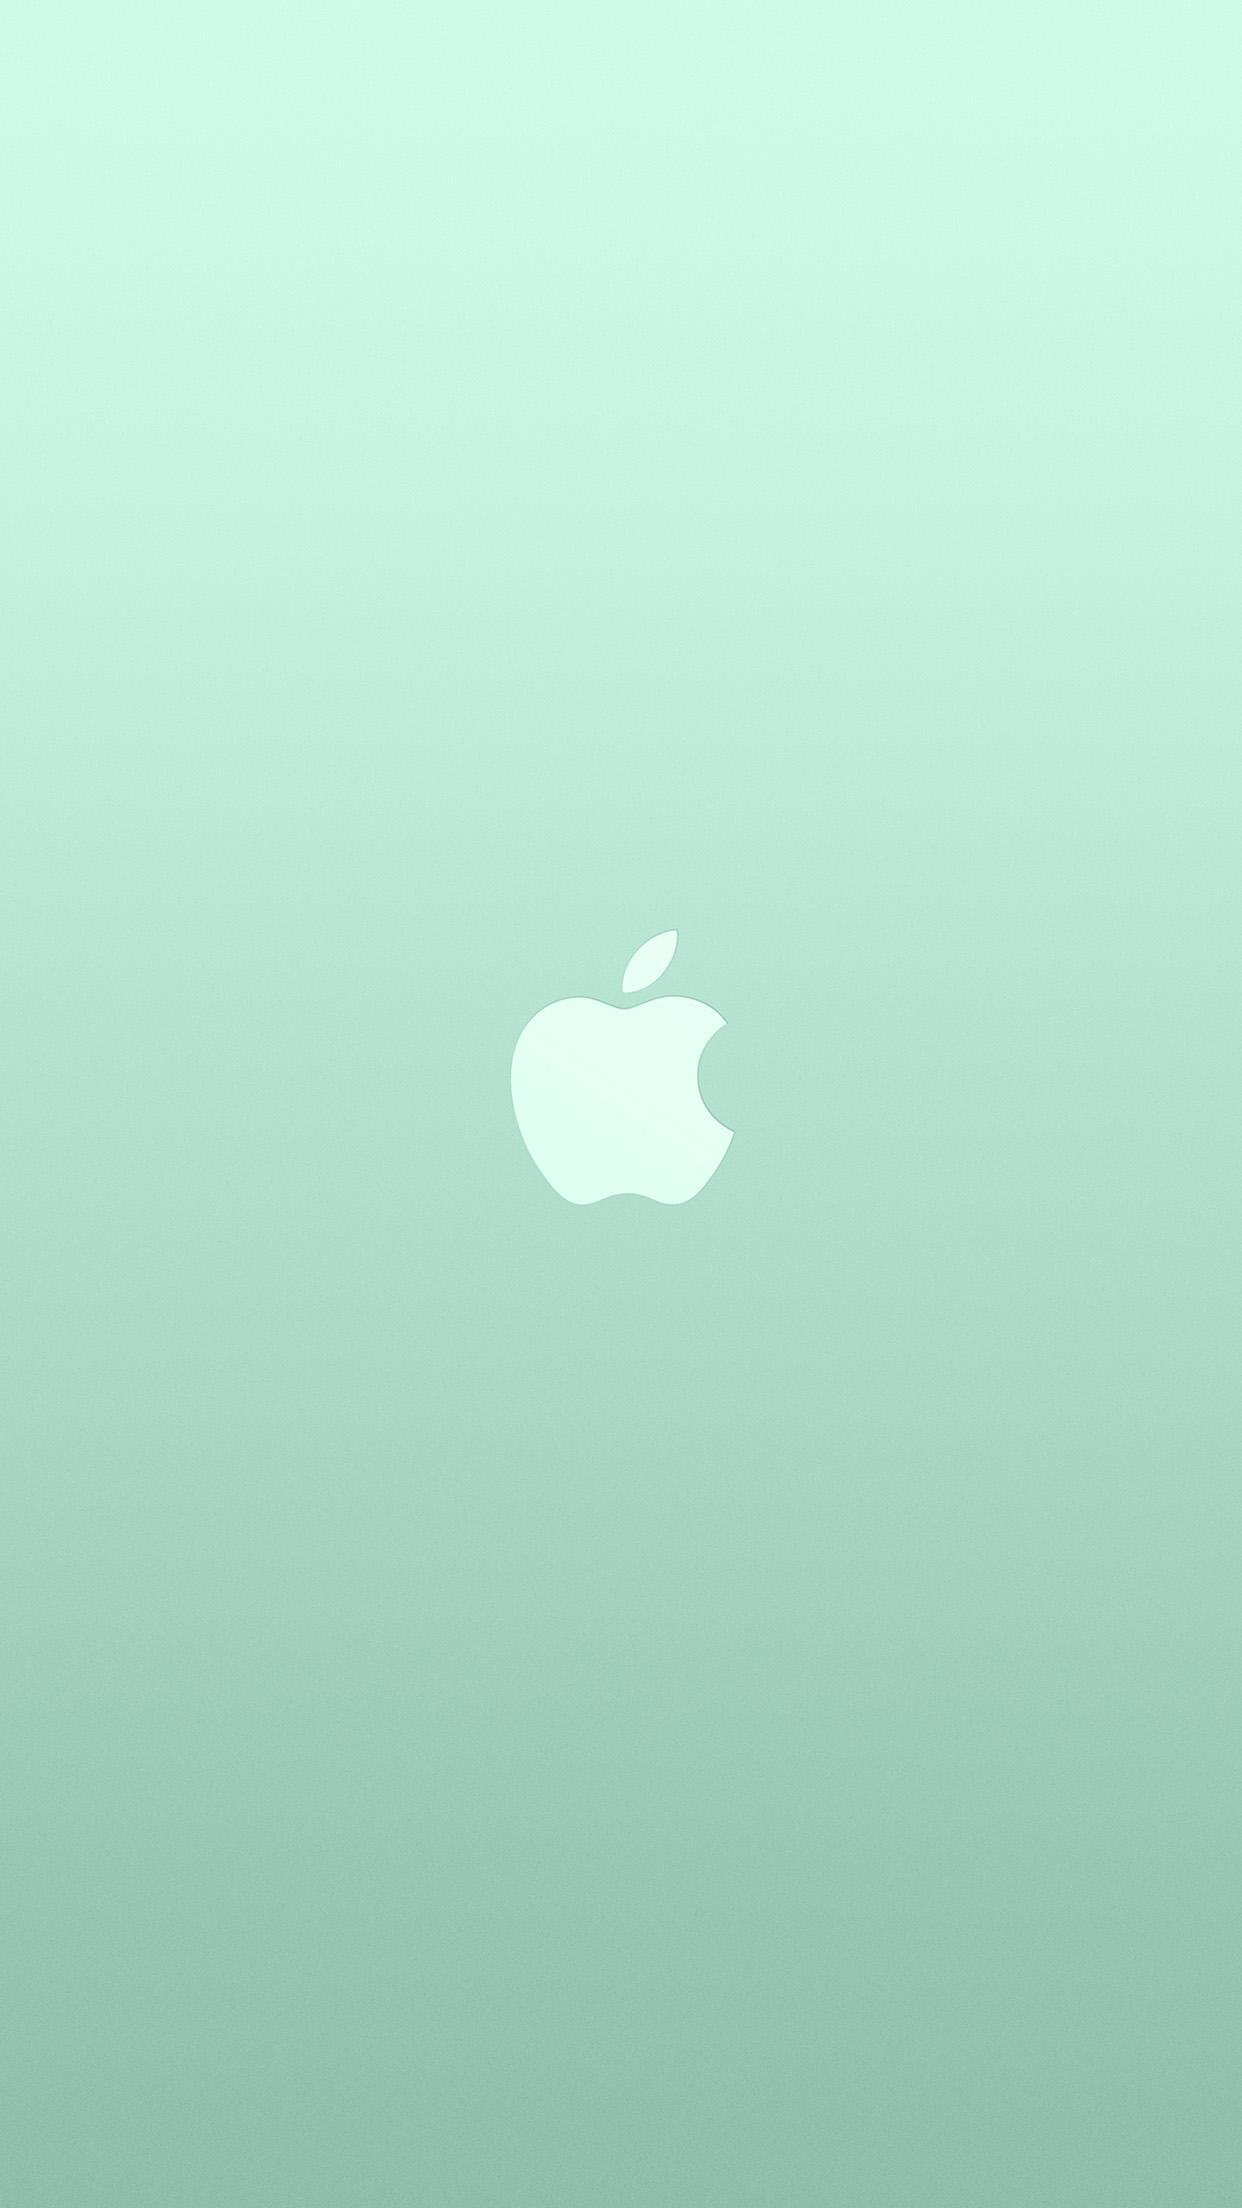 Au17 Logo Apple Green White Minimal Illustration Art Wallpaper